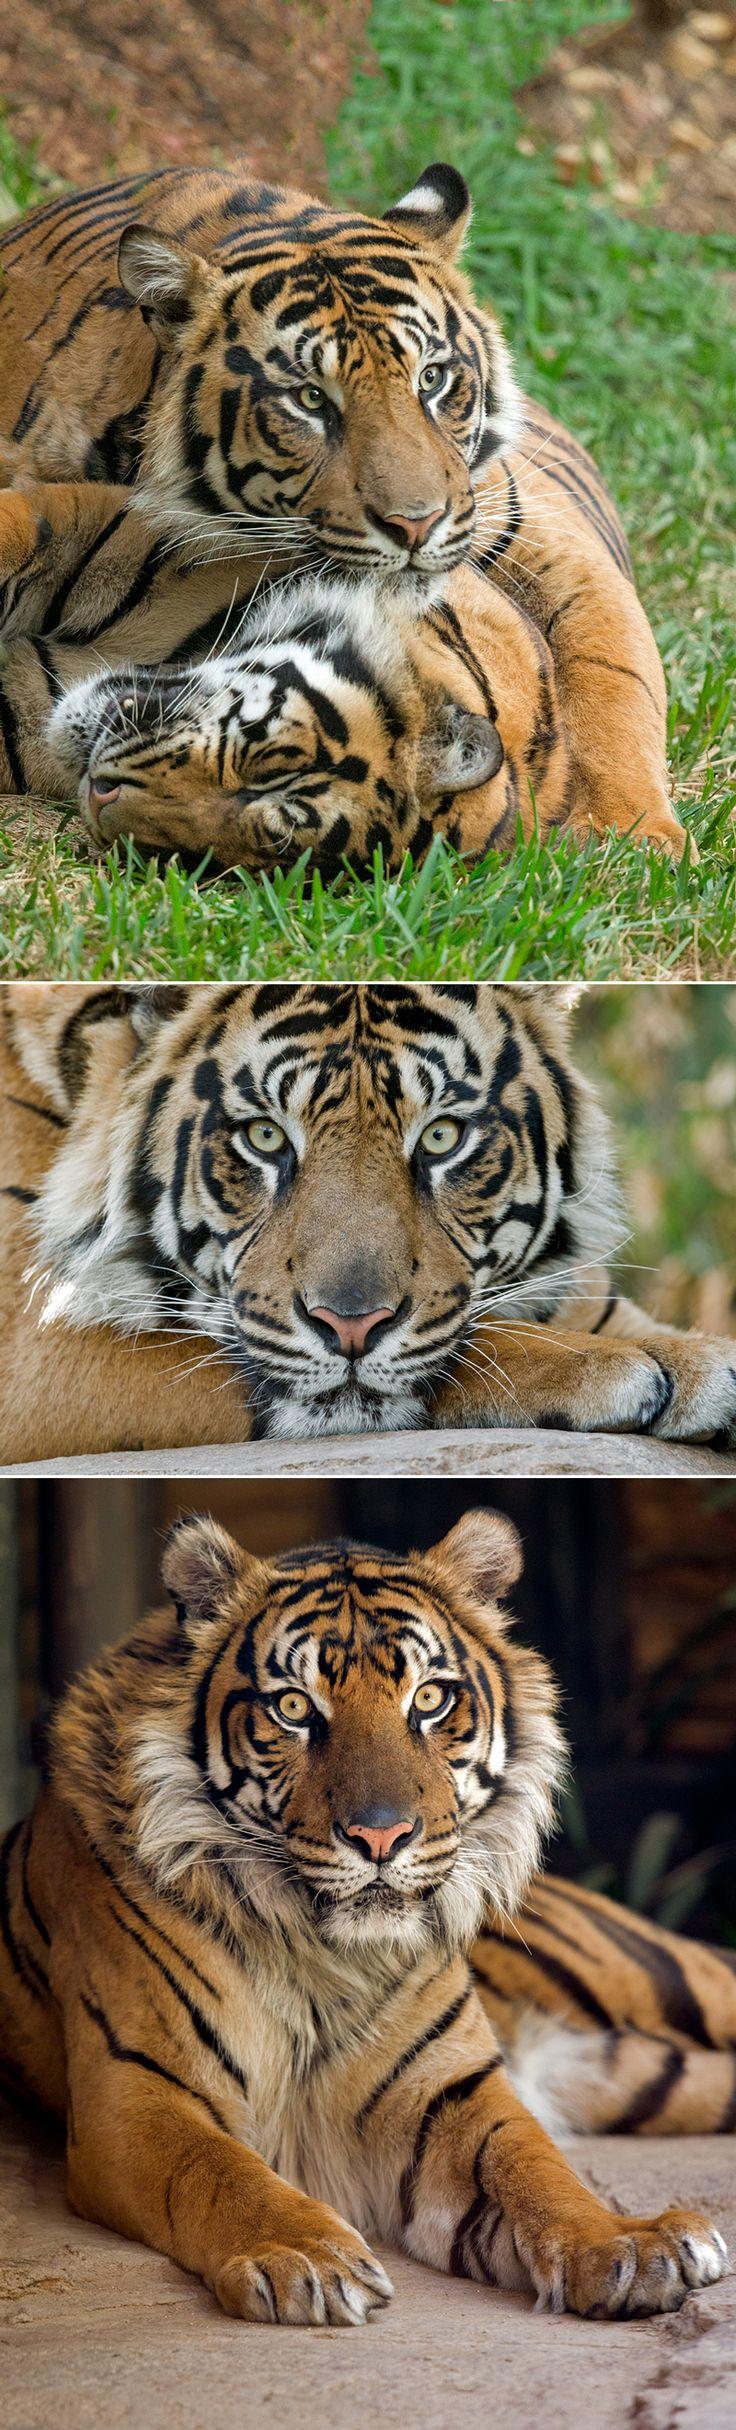 #Tiger guys by Darrell Ybarrondo